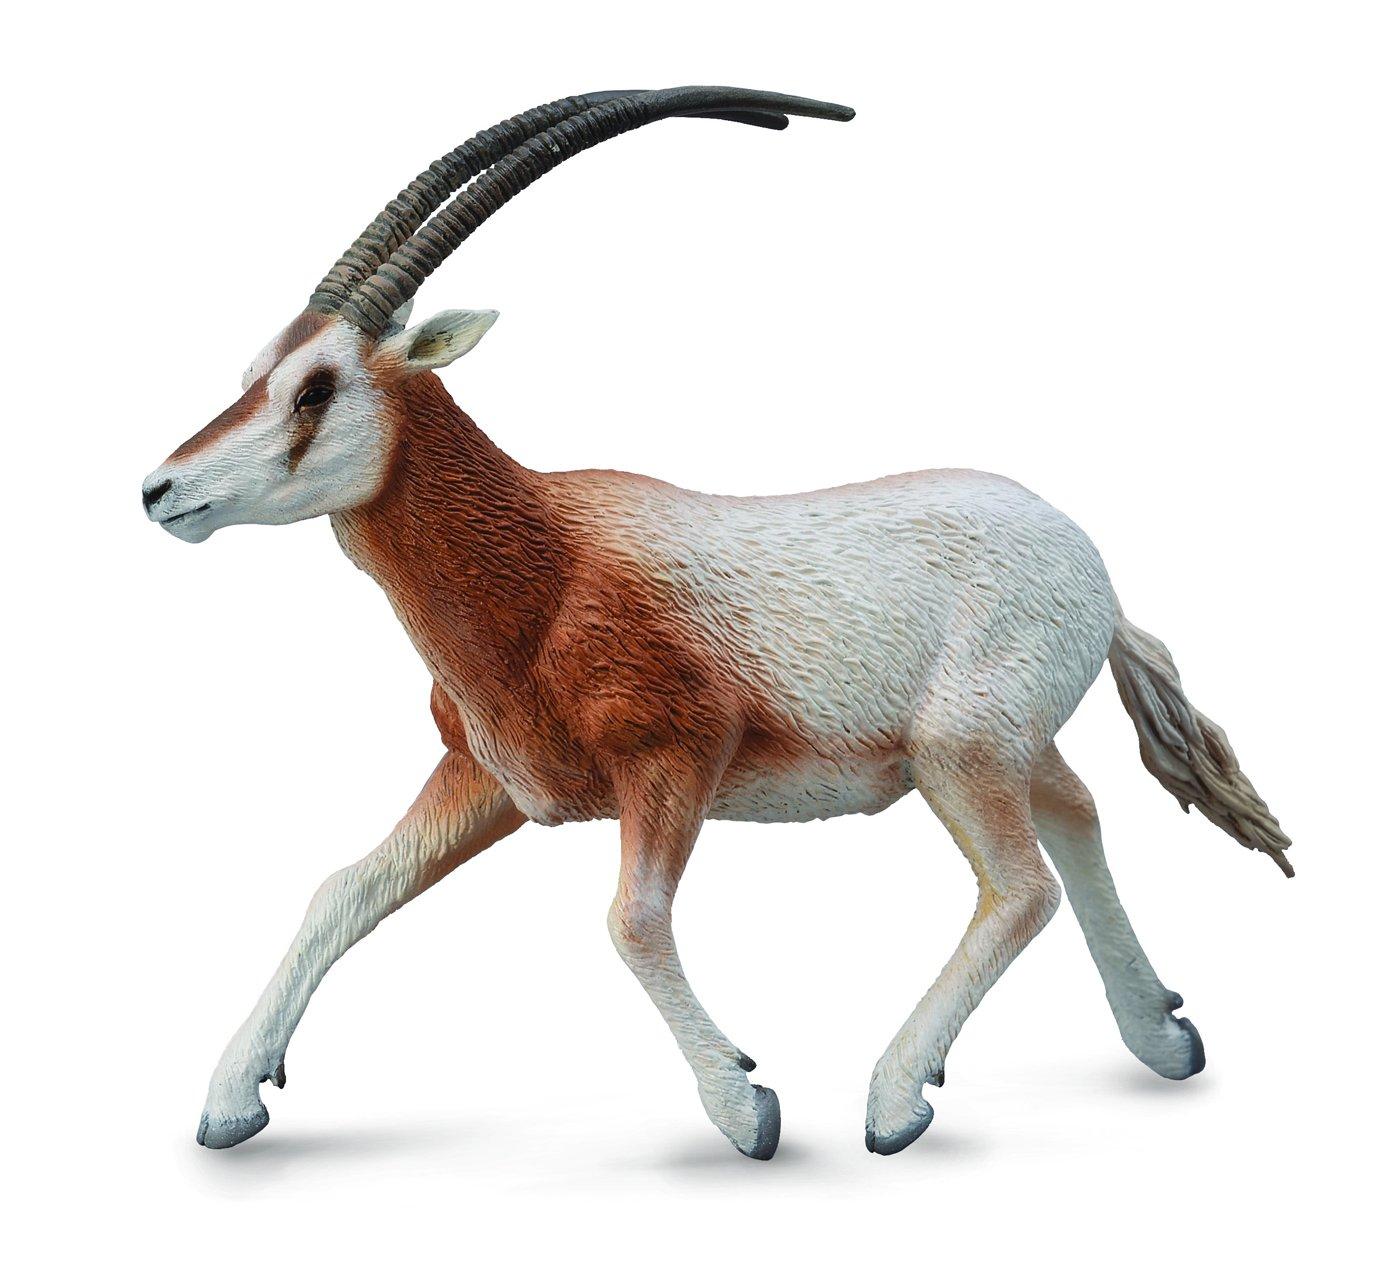 Collecta - Antilope Africano (Orix Blanco) -L- 88637 (90188637) animales miniaturas replicas